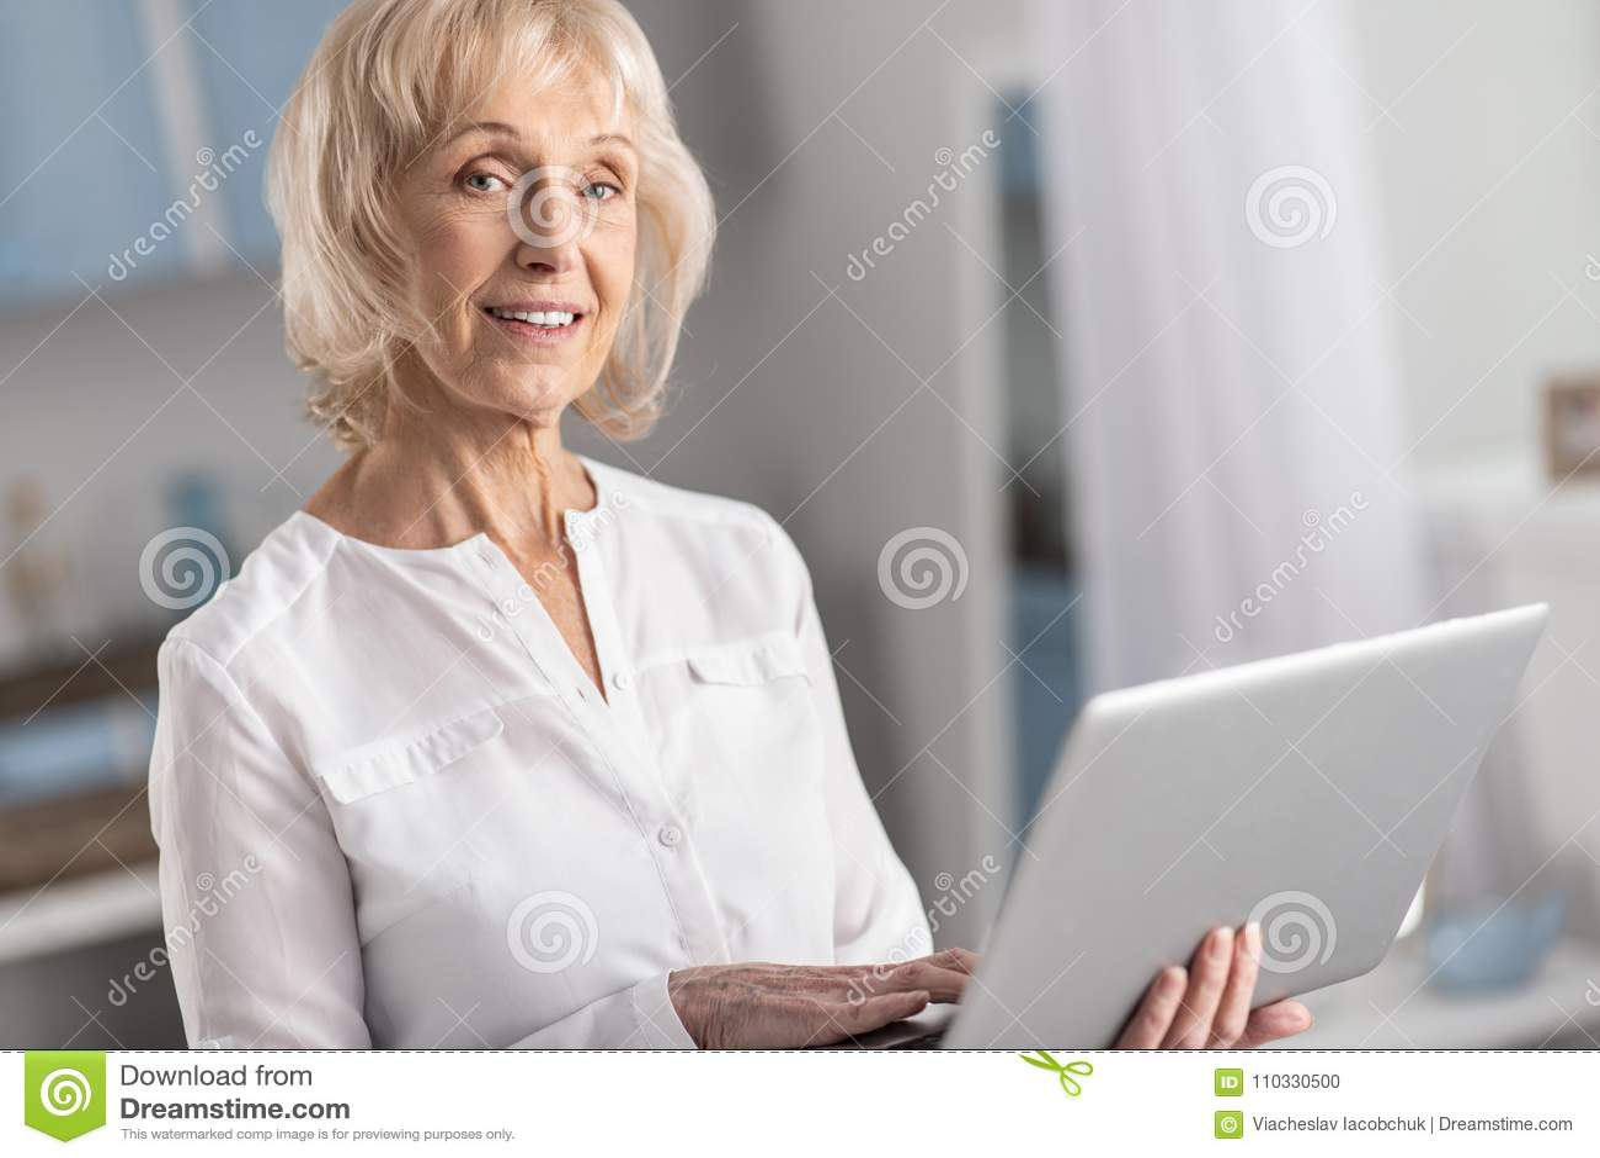 Cam mature web woman